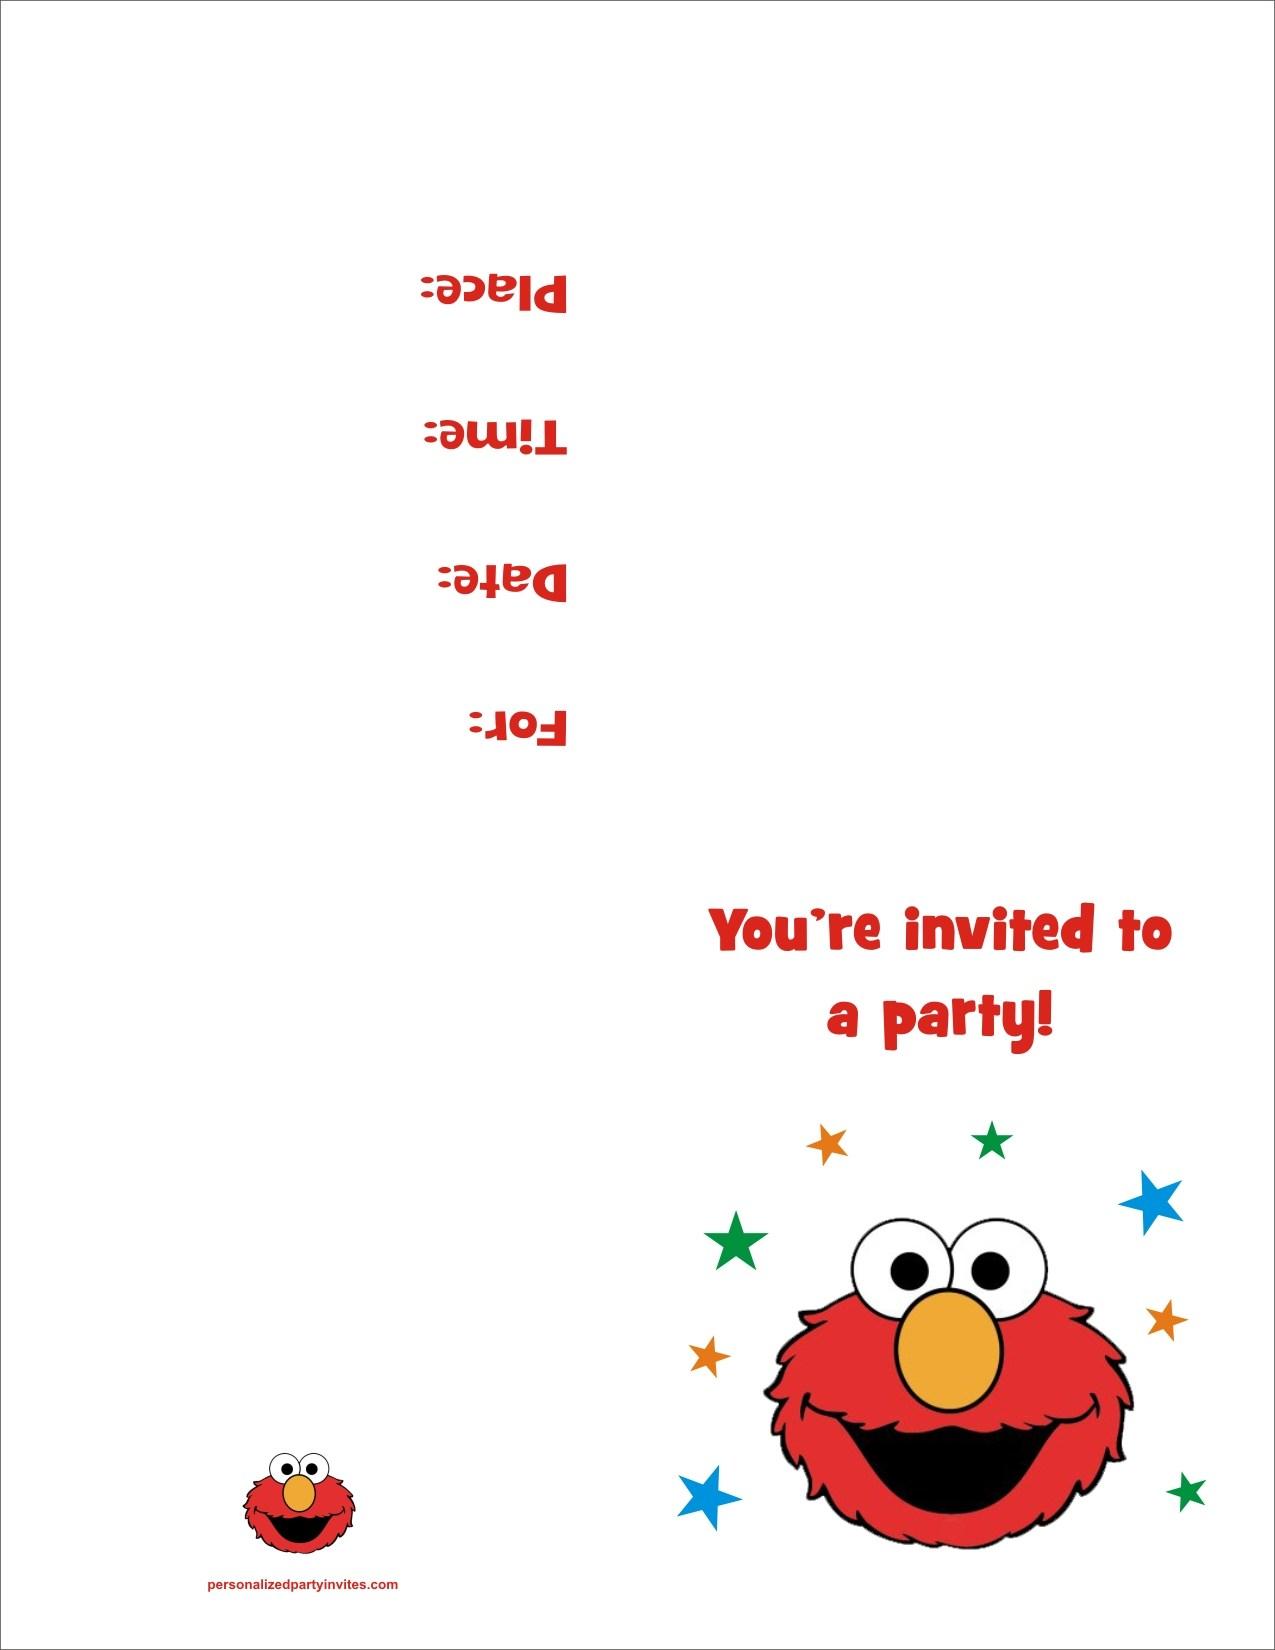 elmo free printable birthday party invitation personalized party invites